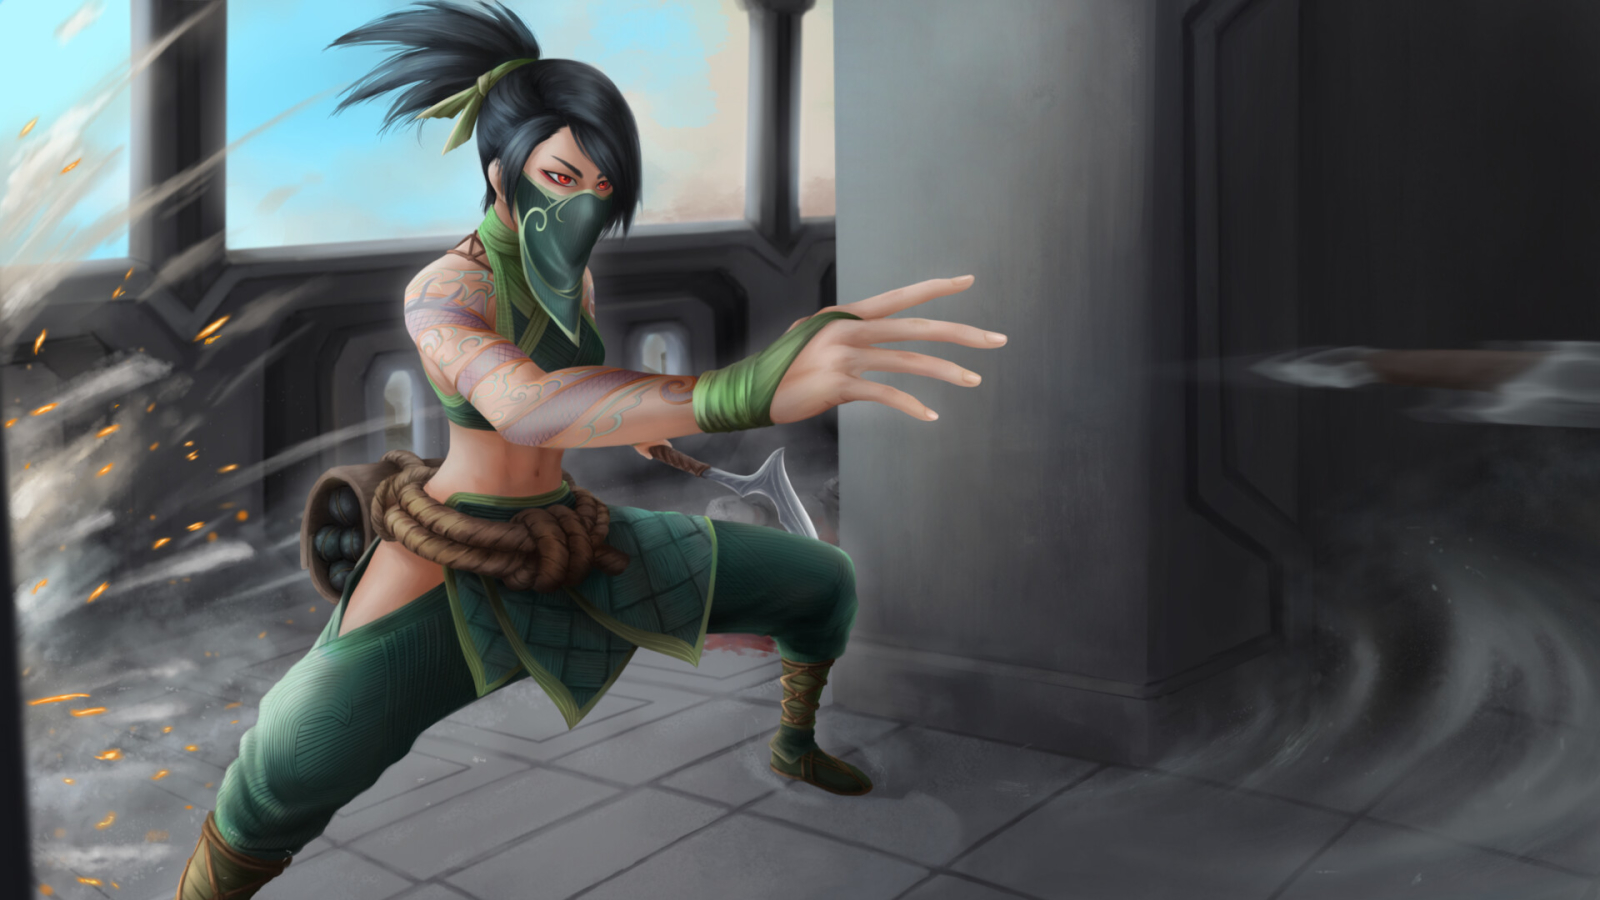 Akali from League Of Legends Wallpaper in 1600x900 Resolution